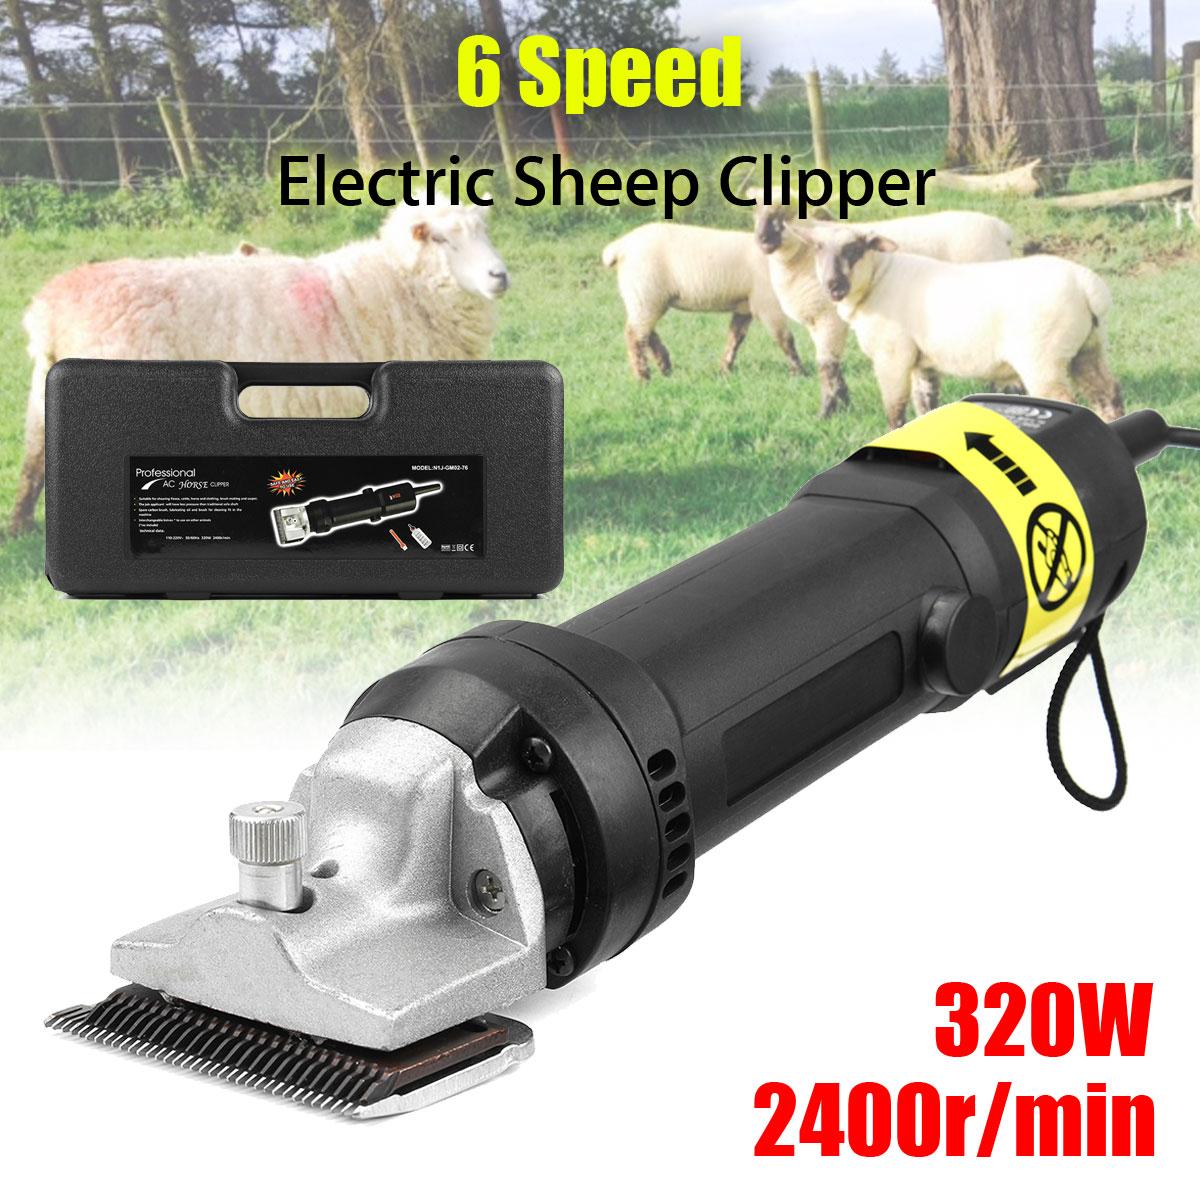 110 240V 320W Professional Electric Animal Horse Camel Dog Shear Clipper Pet Hair Trimmer Hair Shaver